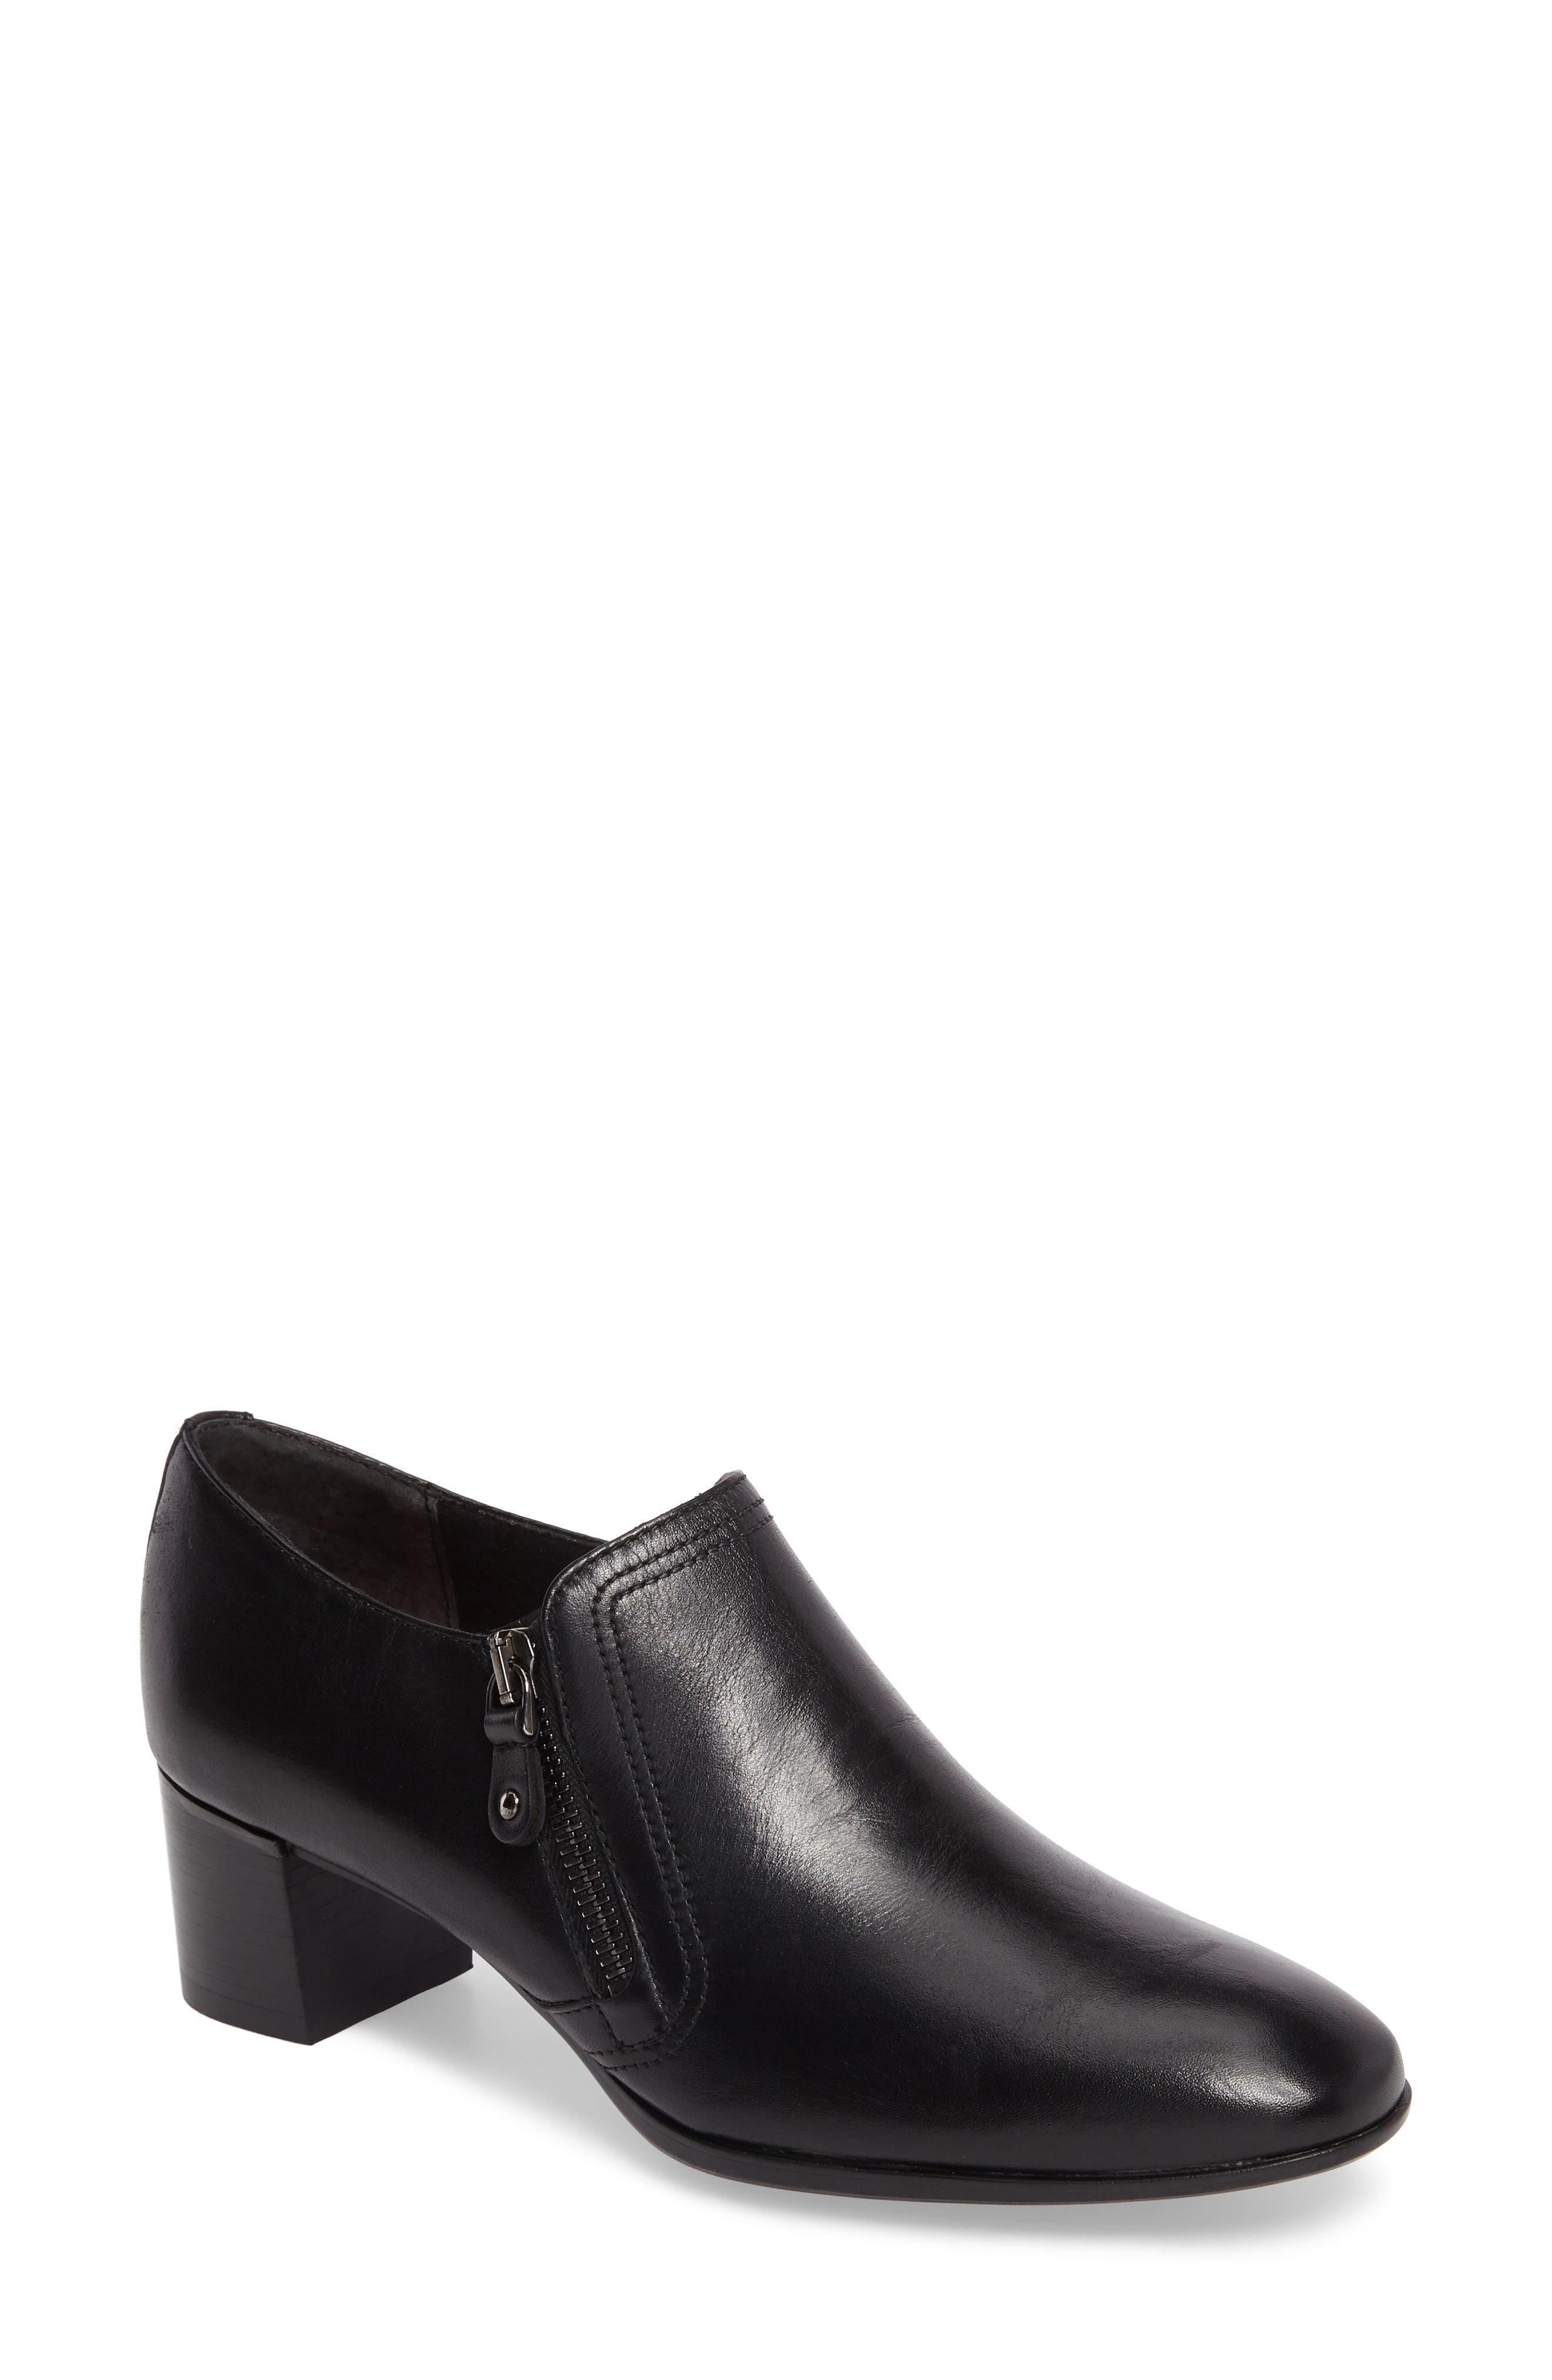 Annee Pump,                             Main thumbnail 1, color,                             Black Leather